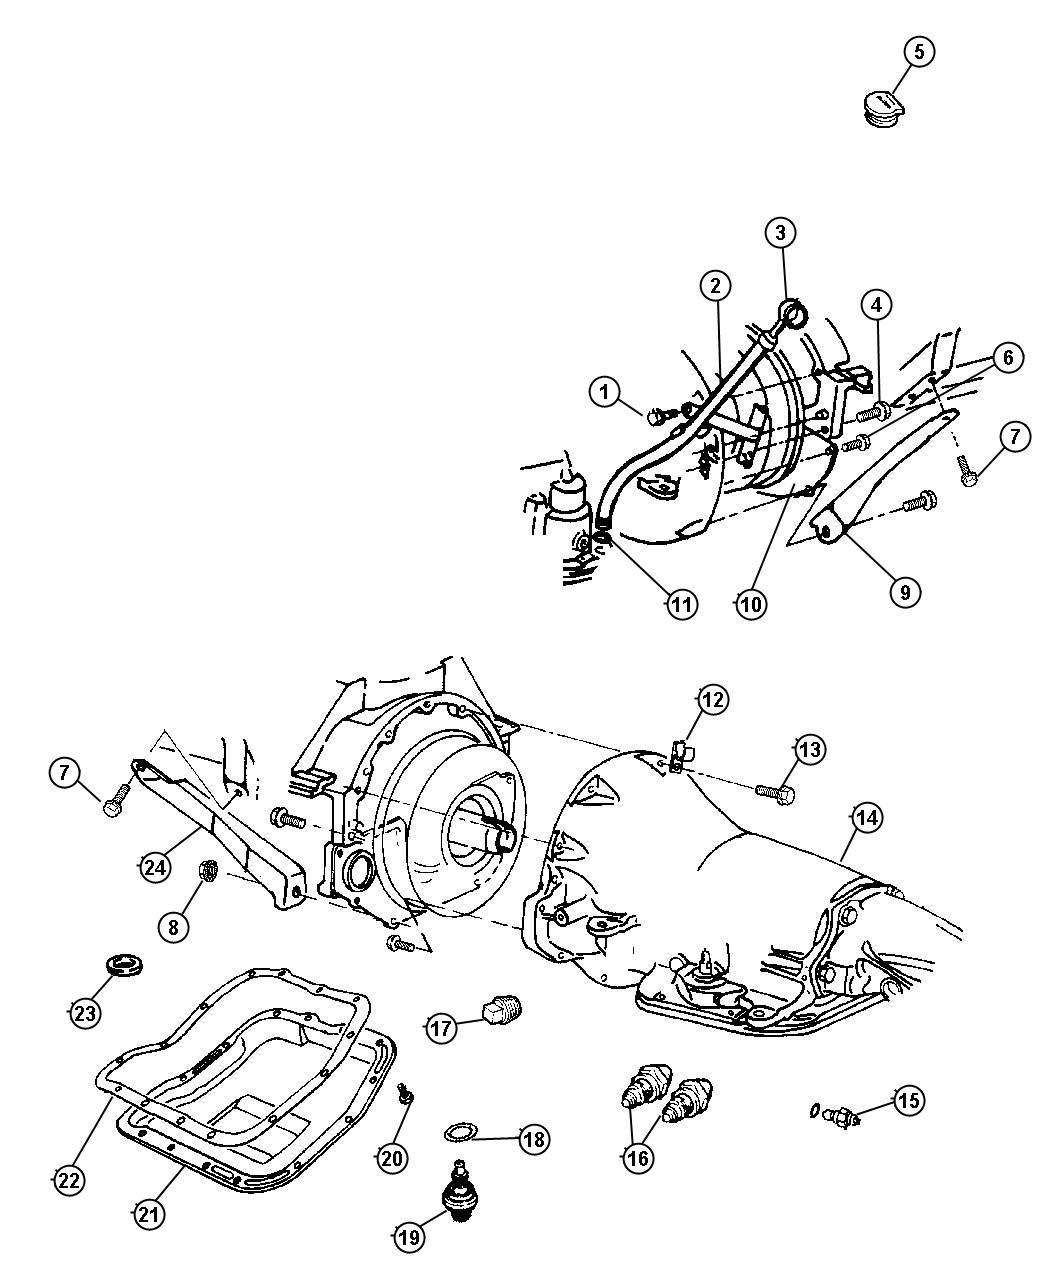 Dodge Ram 1500 Grommet. Timing probe. Bnd, nbr, panclutch